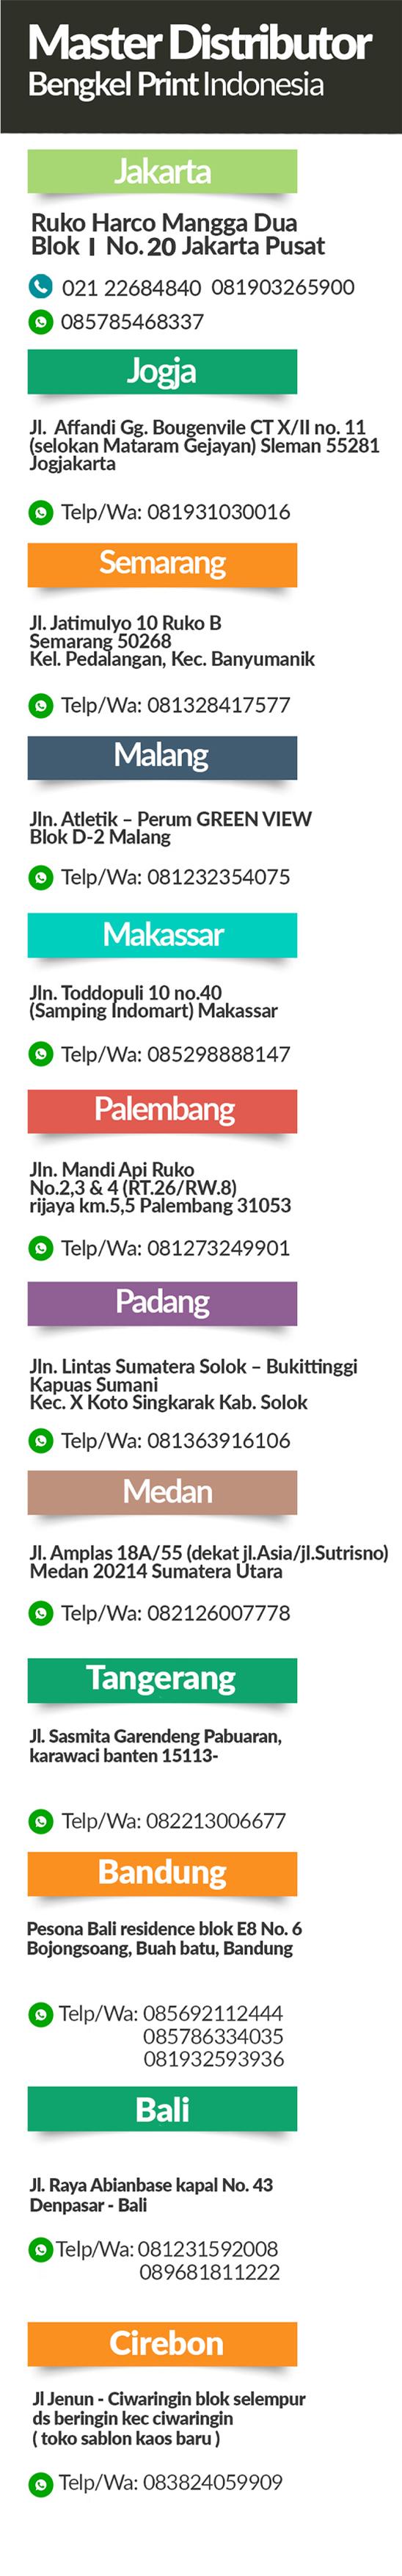 Alamat dealer dan cabang bengkel print indonesia